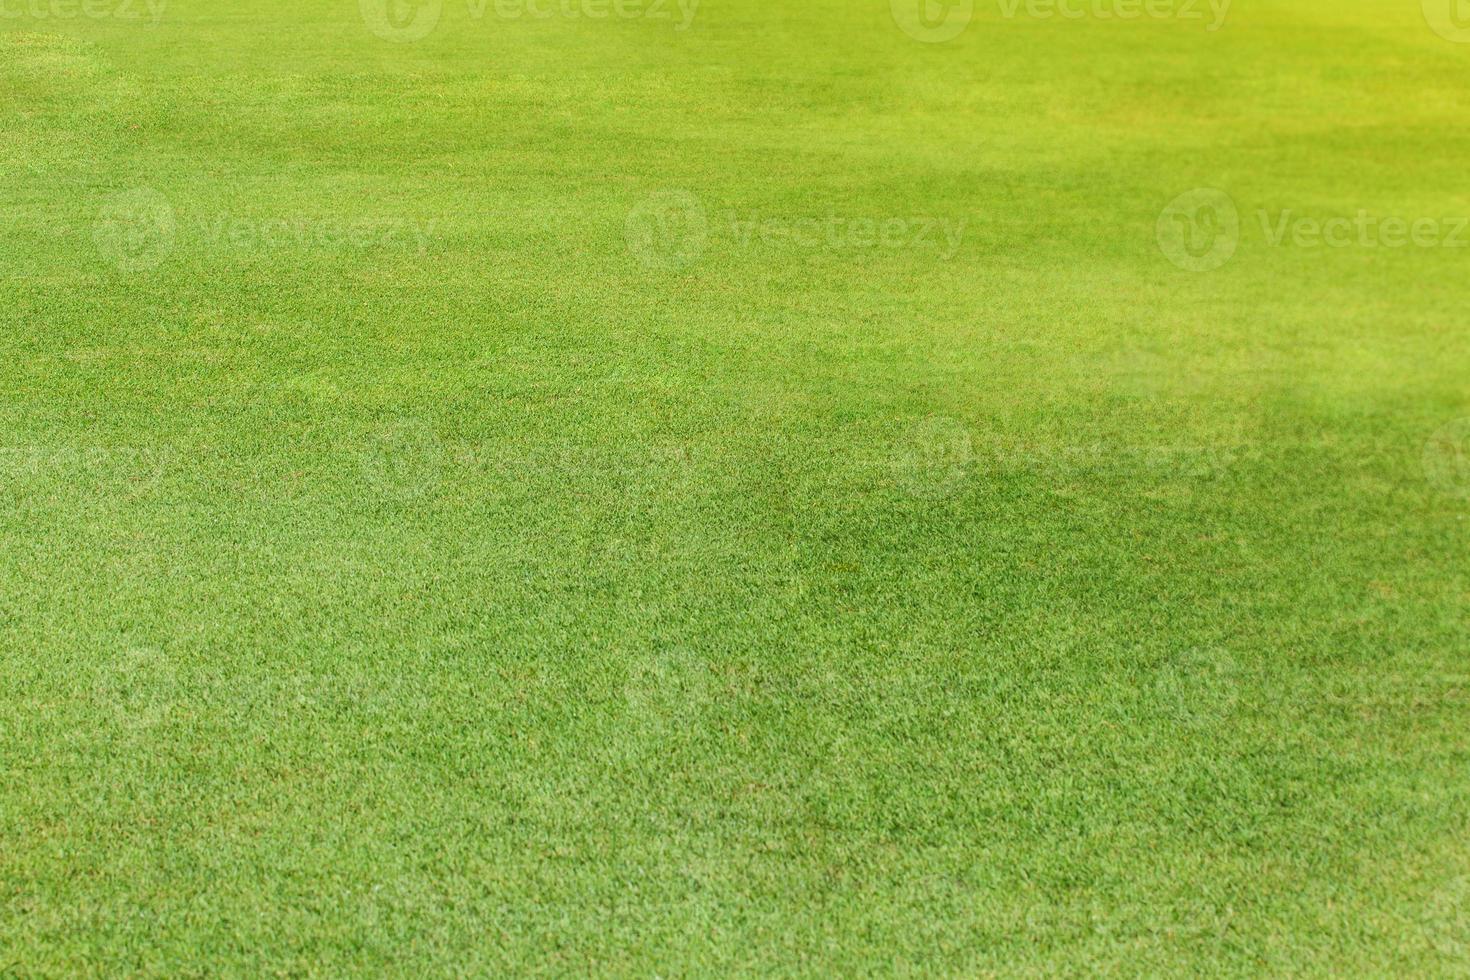 Green grass texture background photo